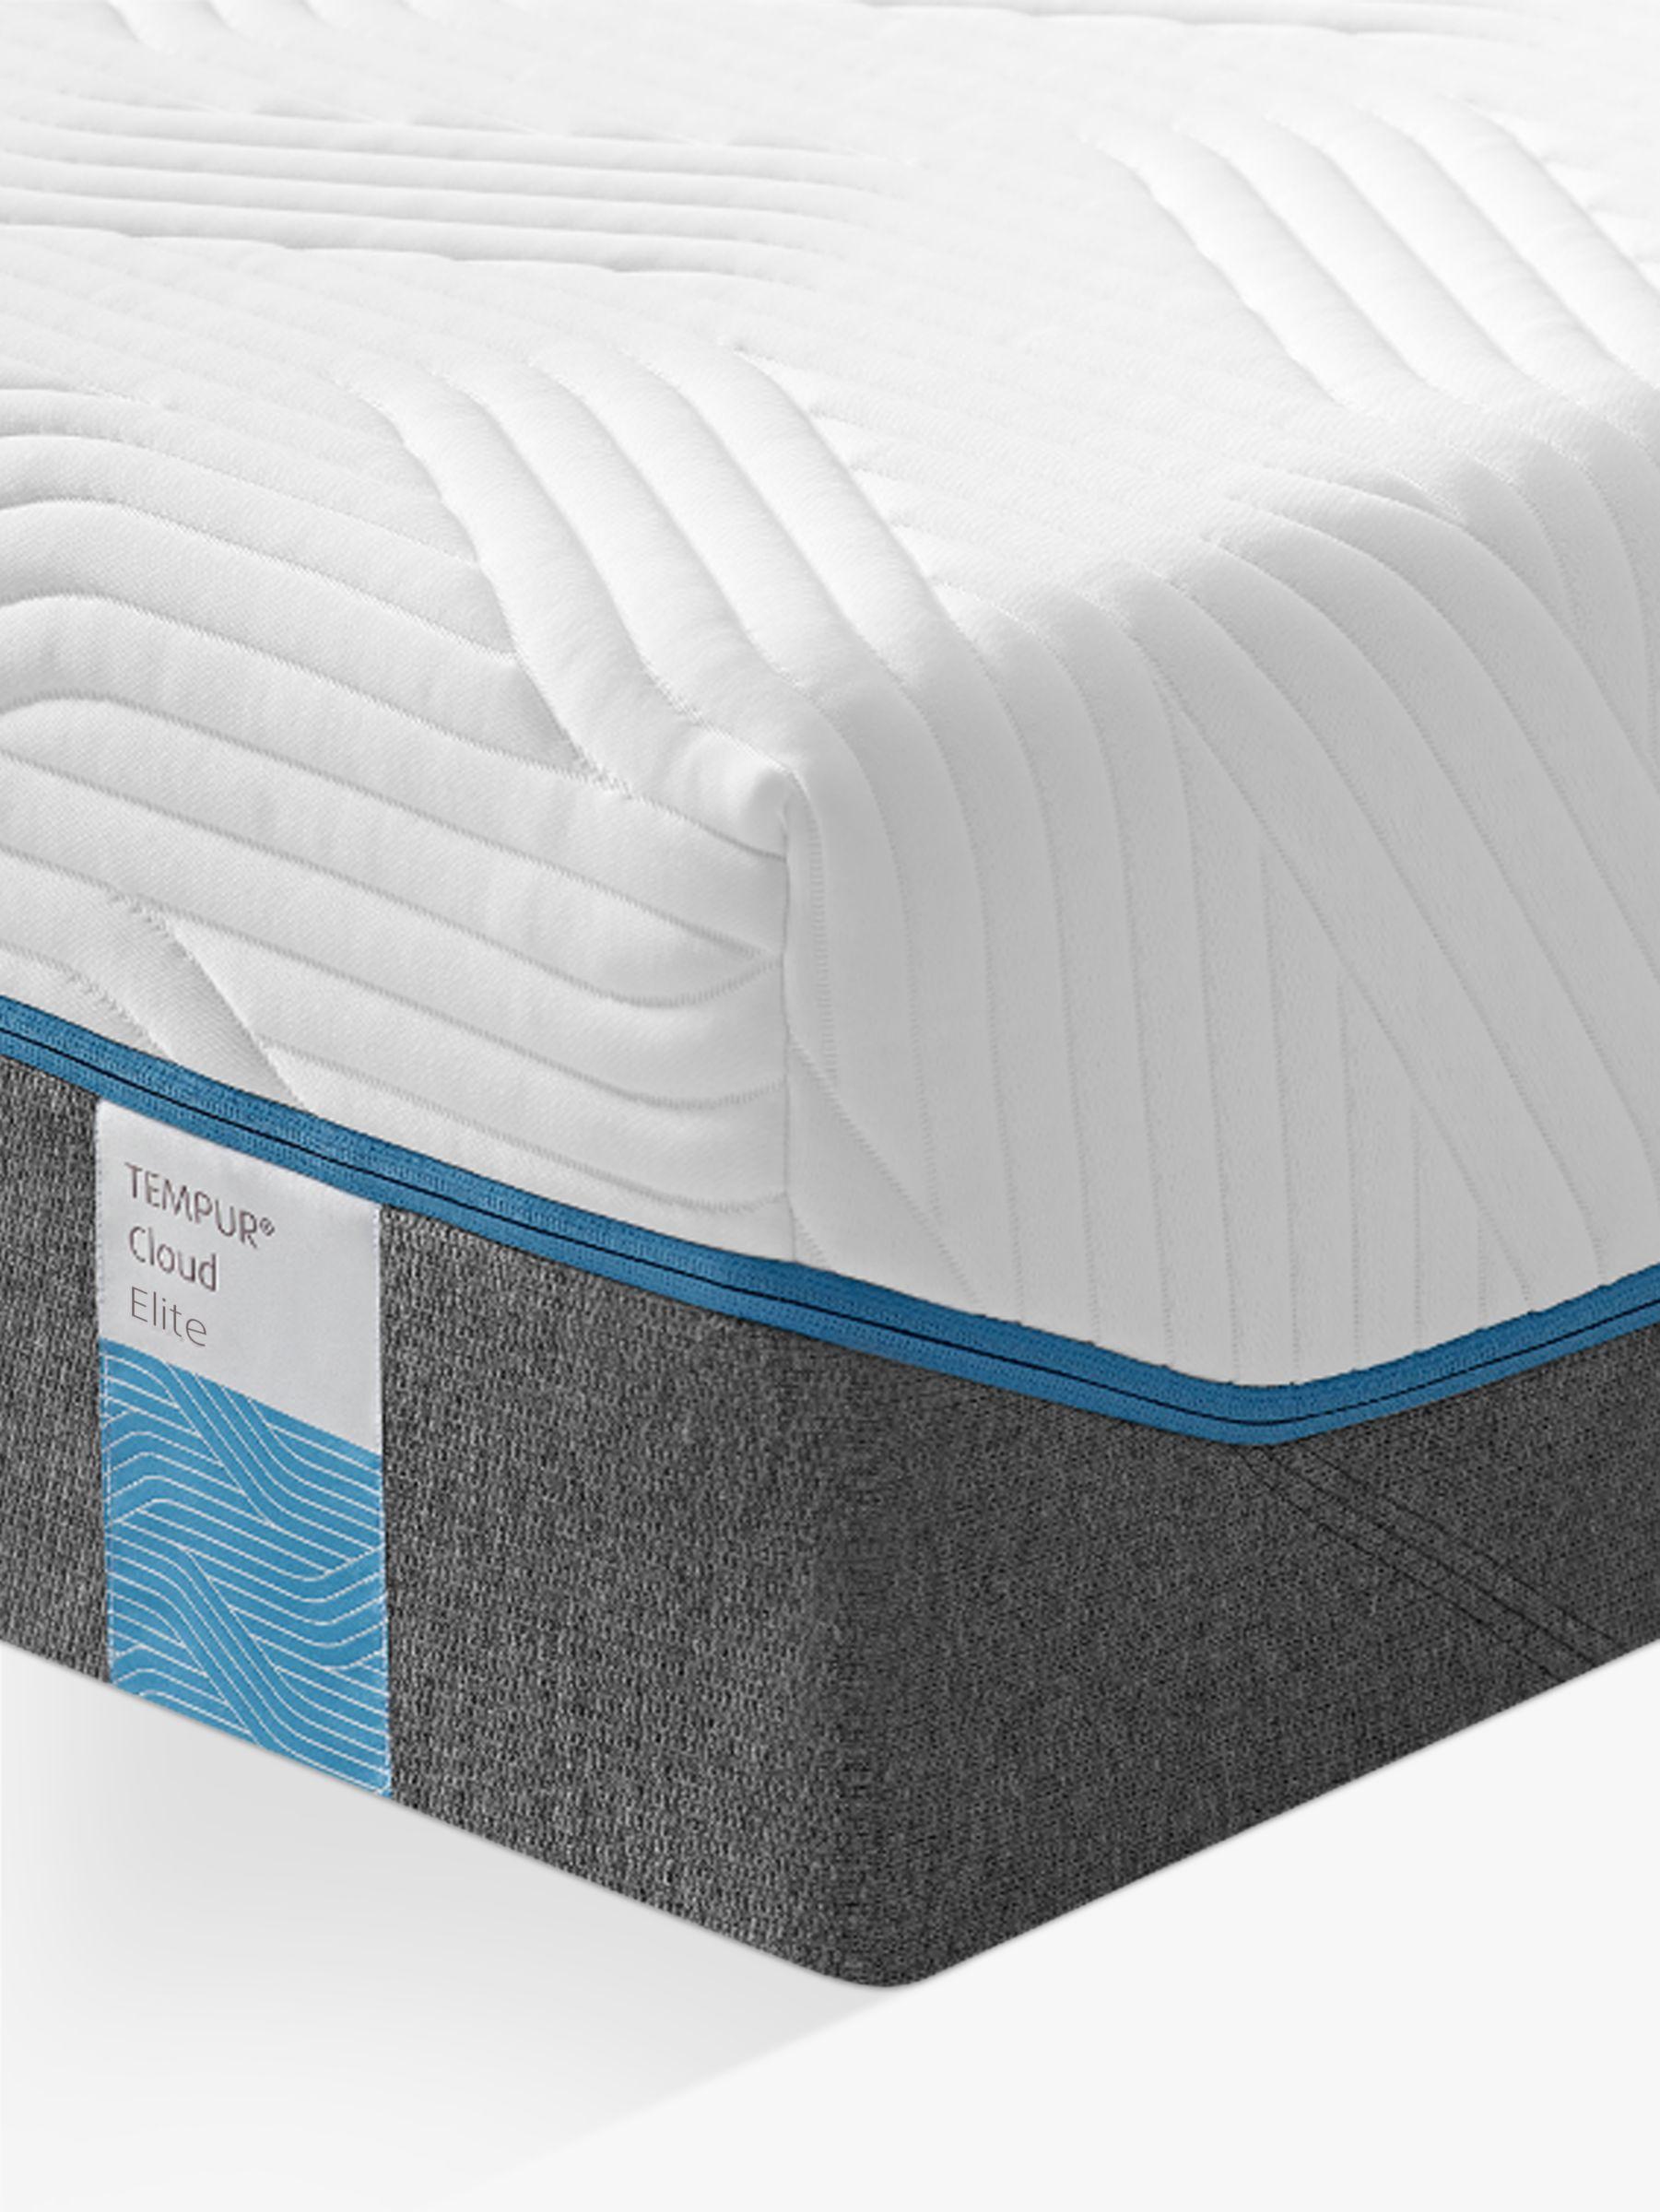 Tempur Tempur Cloud Elite 25 Memory Foam Mattress, Soft, Double